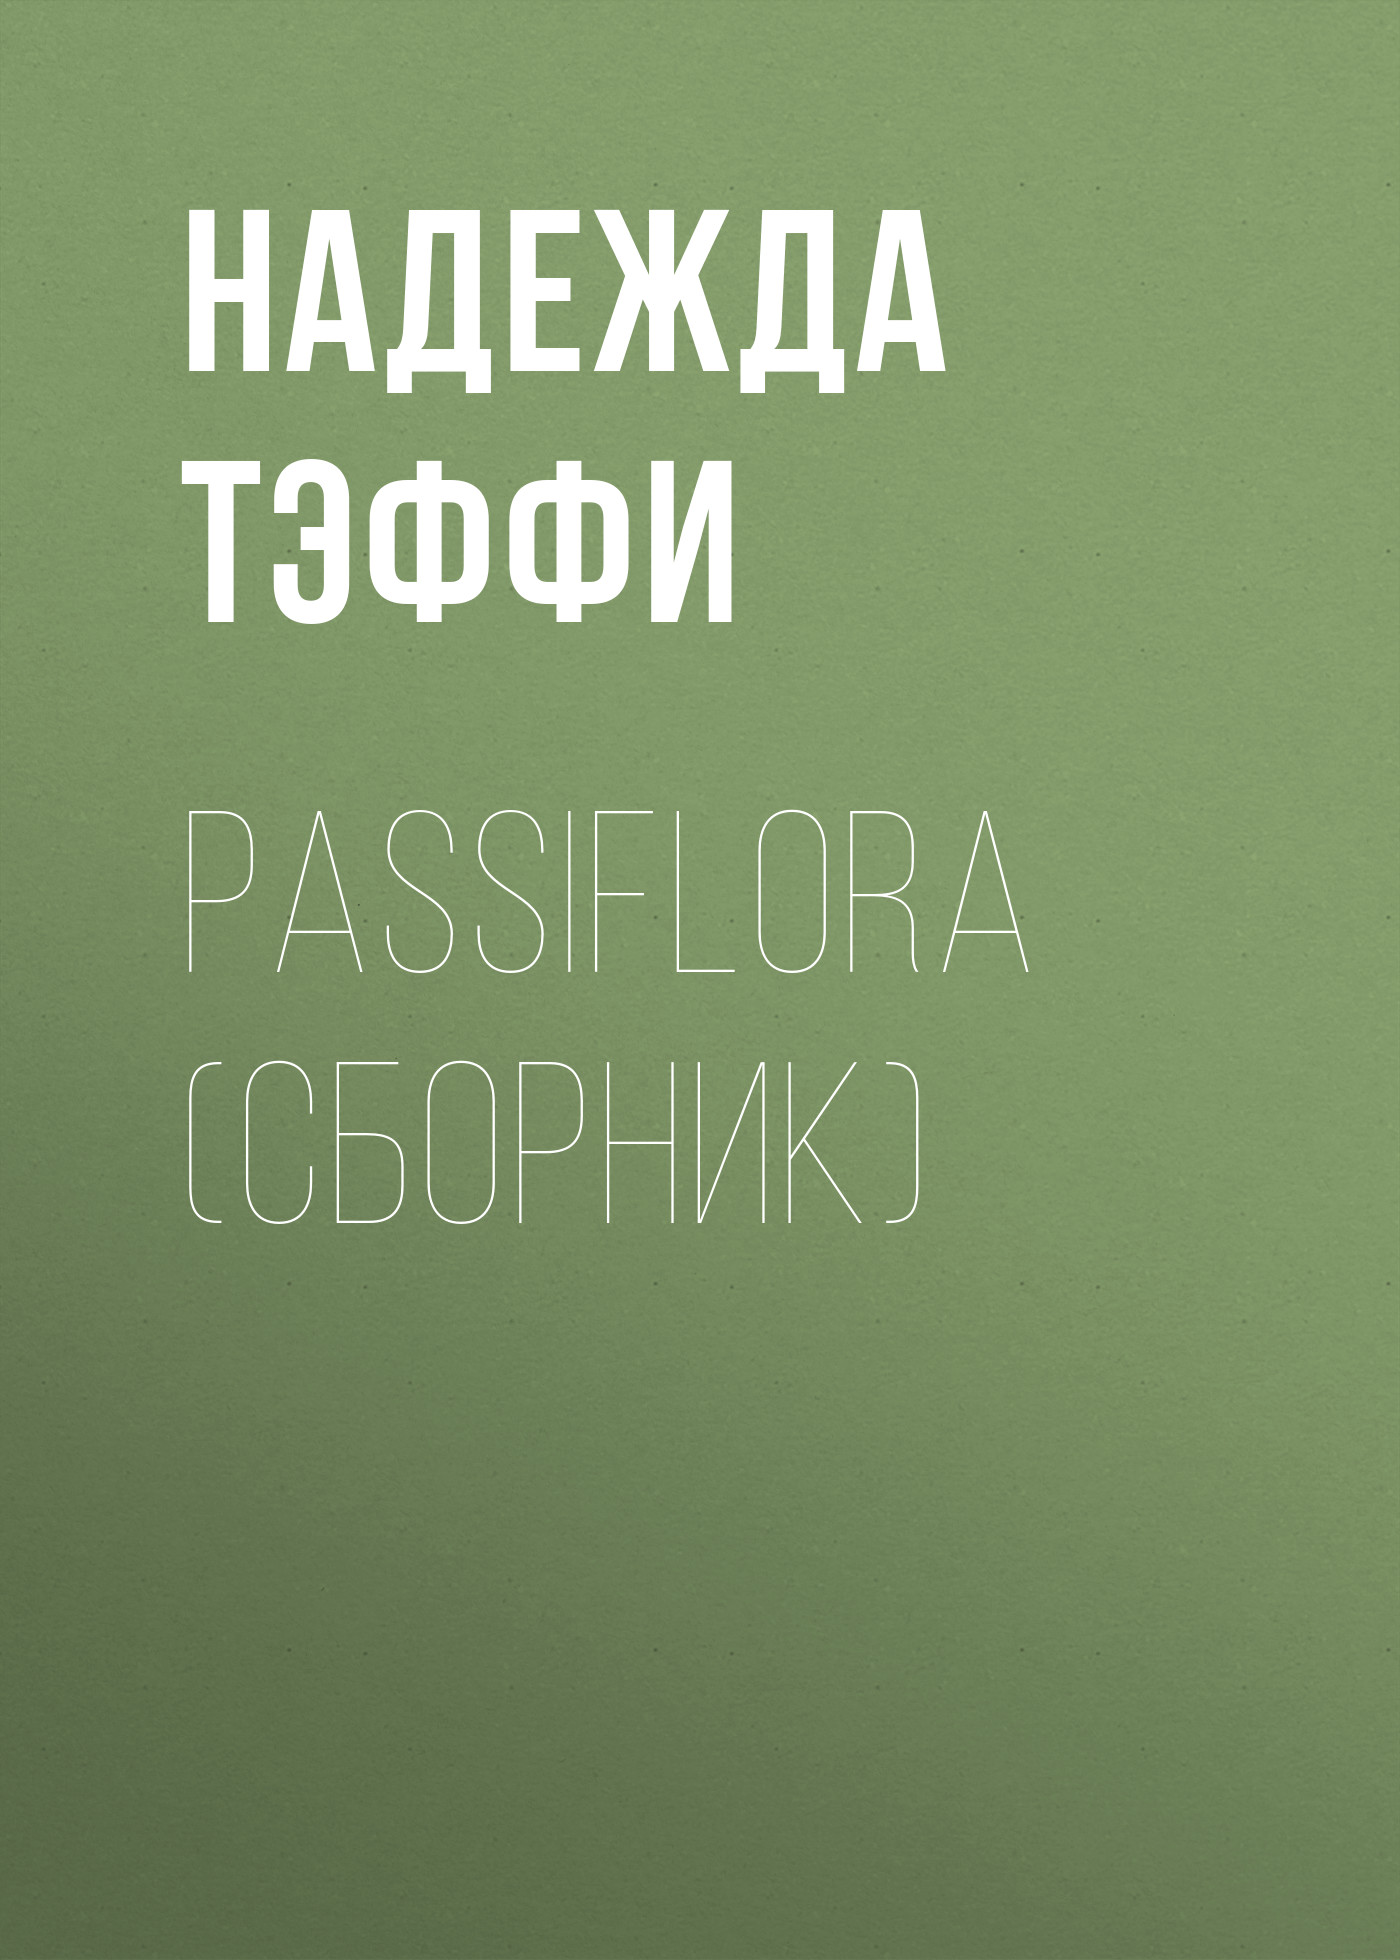 Надежда Тэффи Passiflora (сборник) надежда тэффи …где бы мы не причалили сборник isbn 978 5 699 49210 7